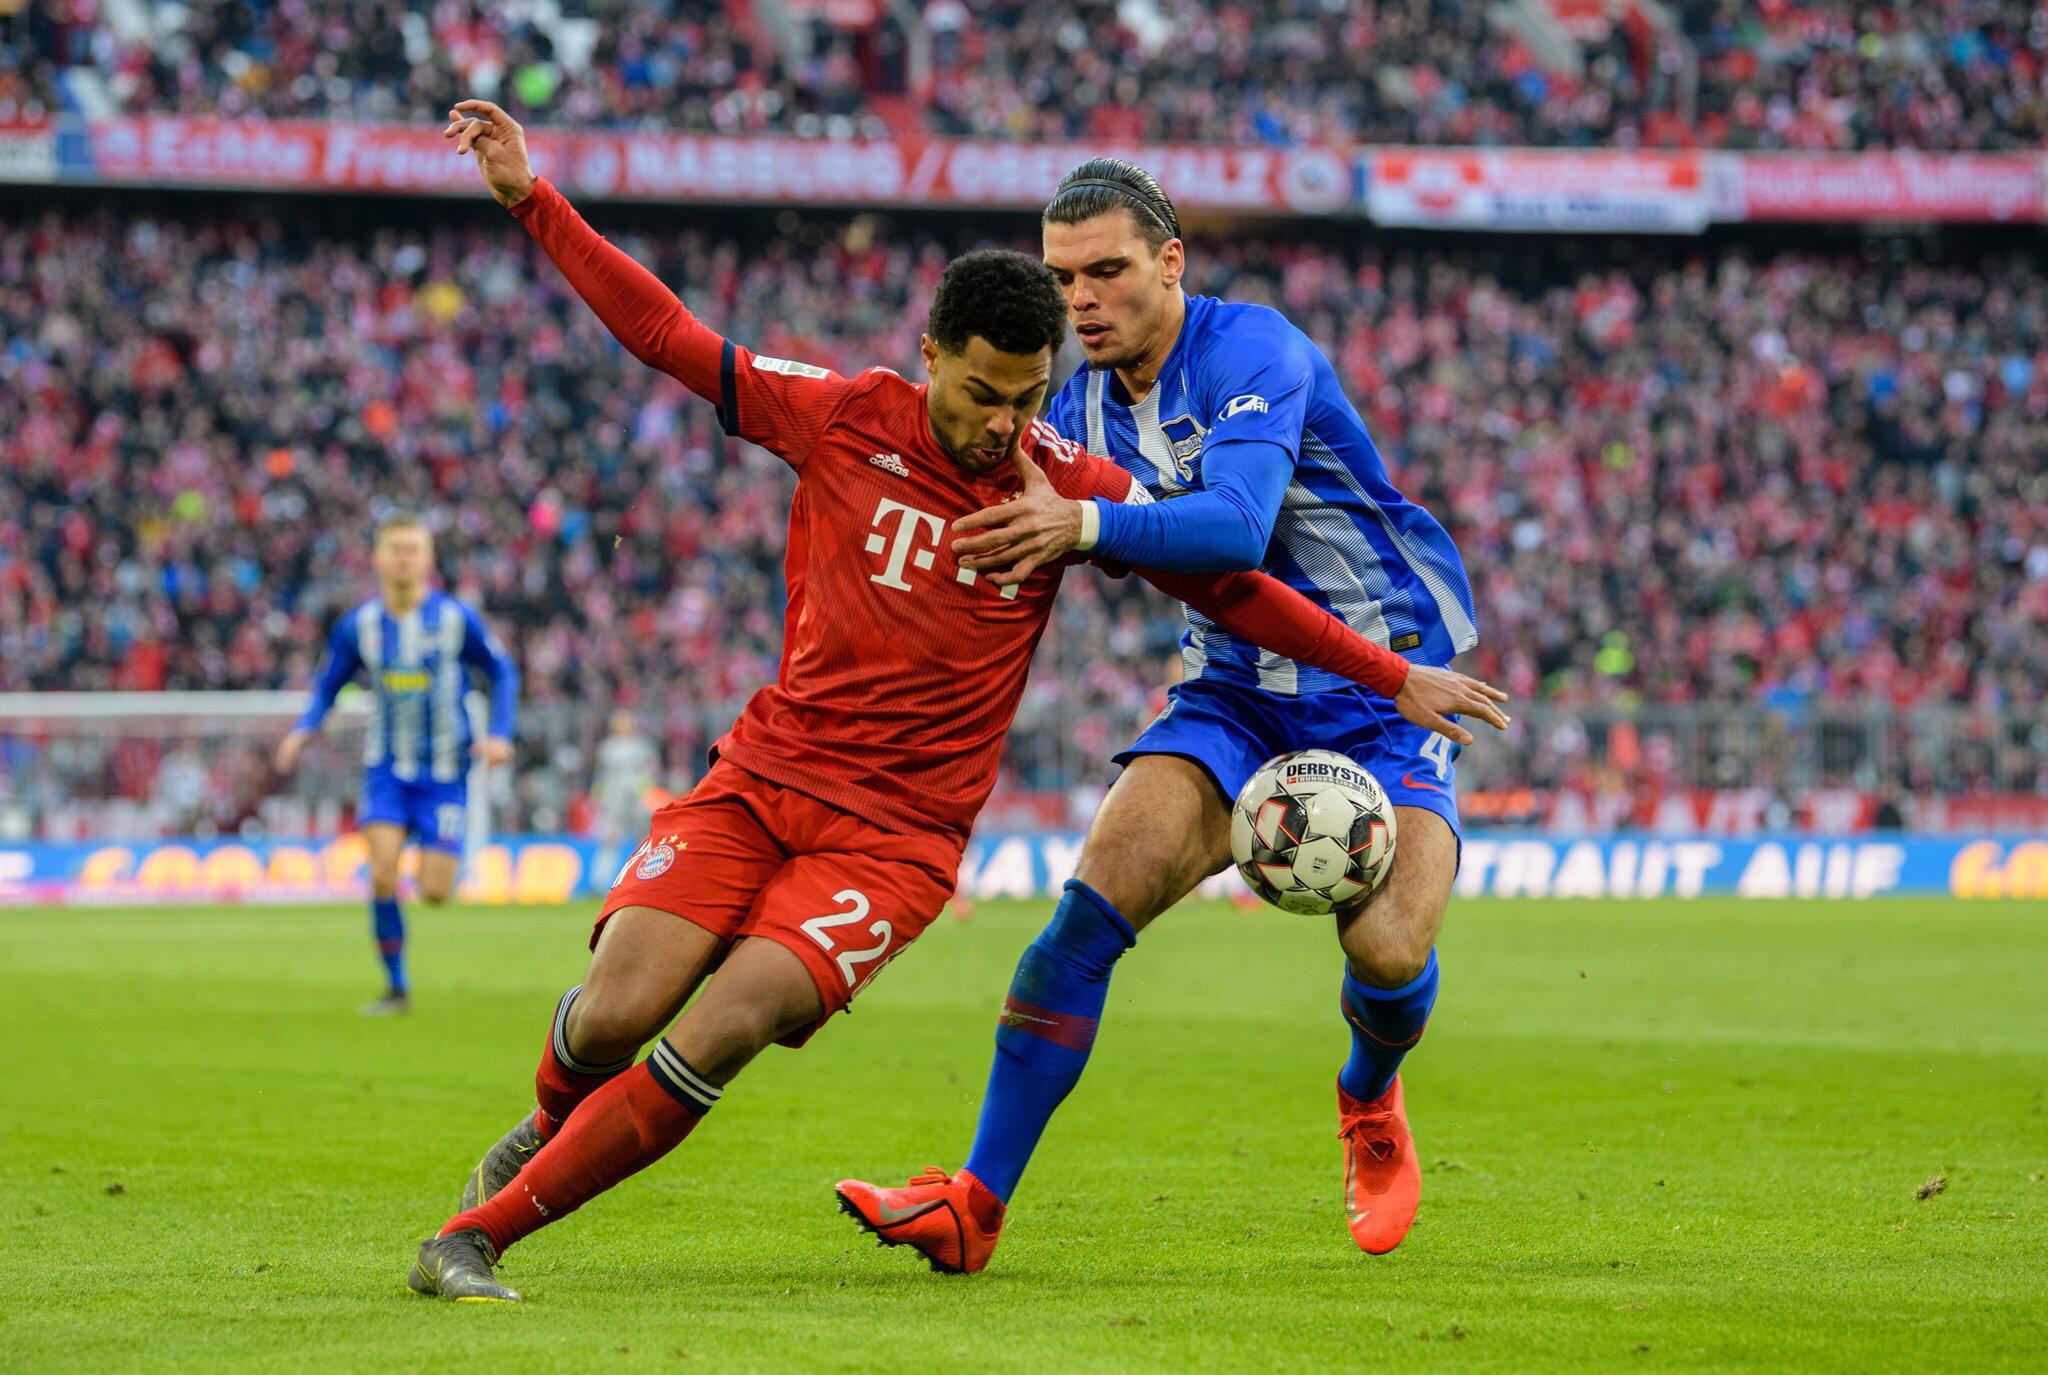 Bild zu Bundesliga, Hertha, Bayern München, FCB